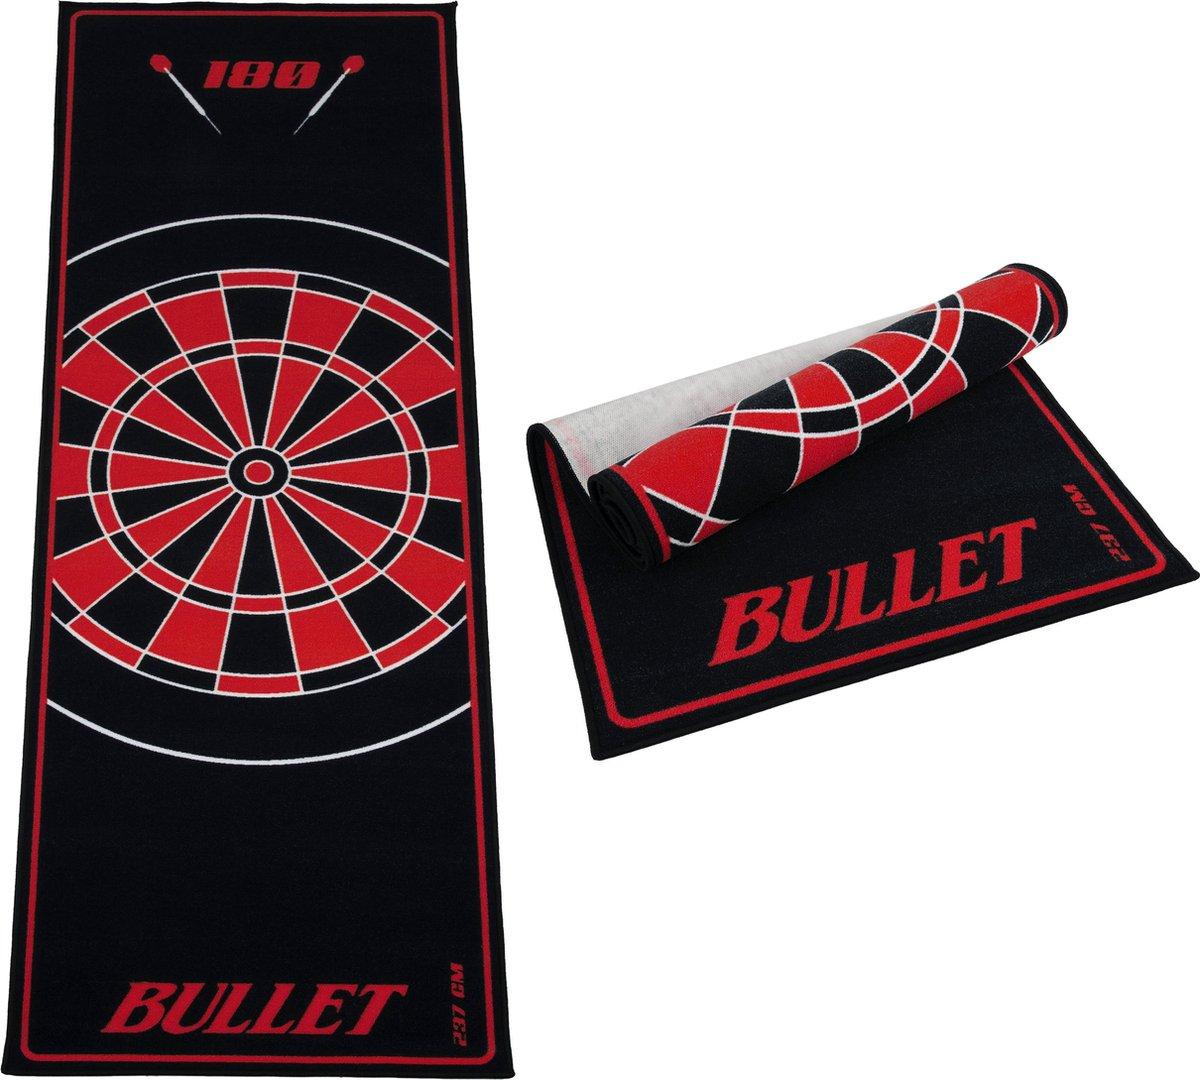 Dartmat - Bullet Rood 237x80 cm - gave mat - Dartvloerkleed